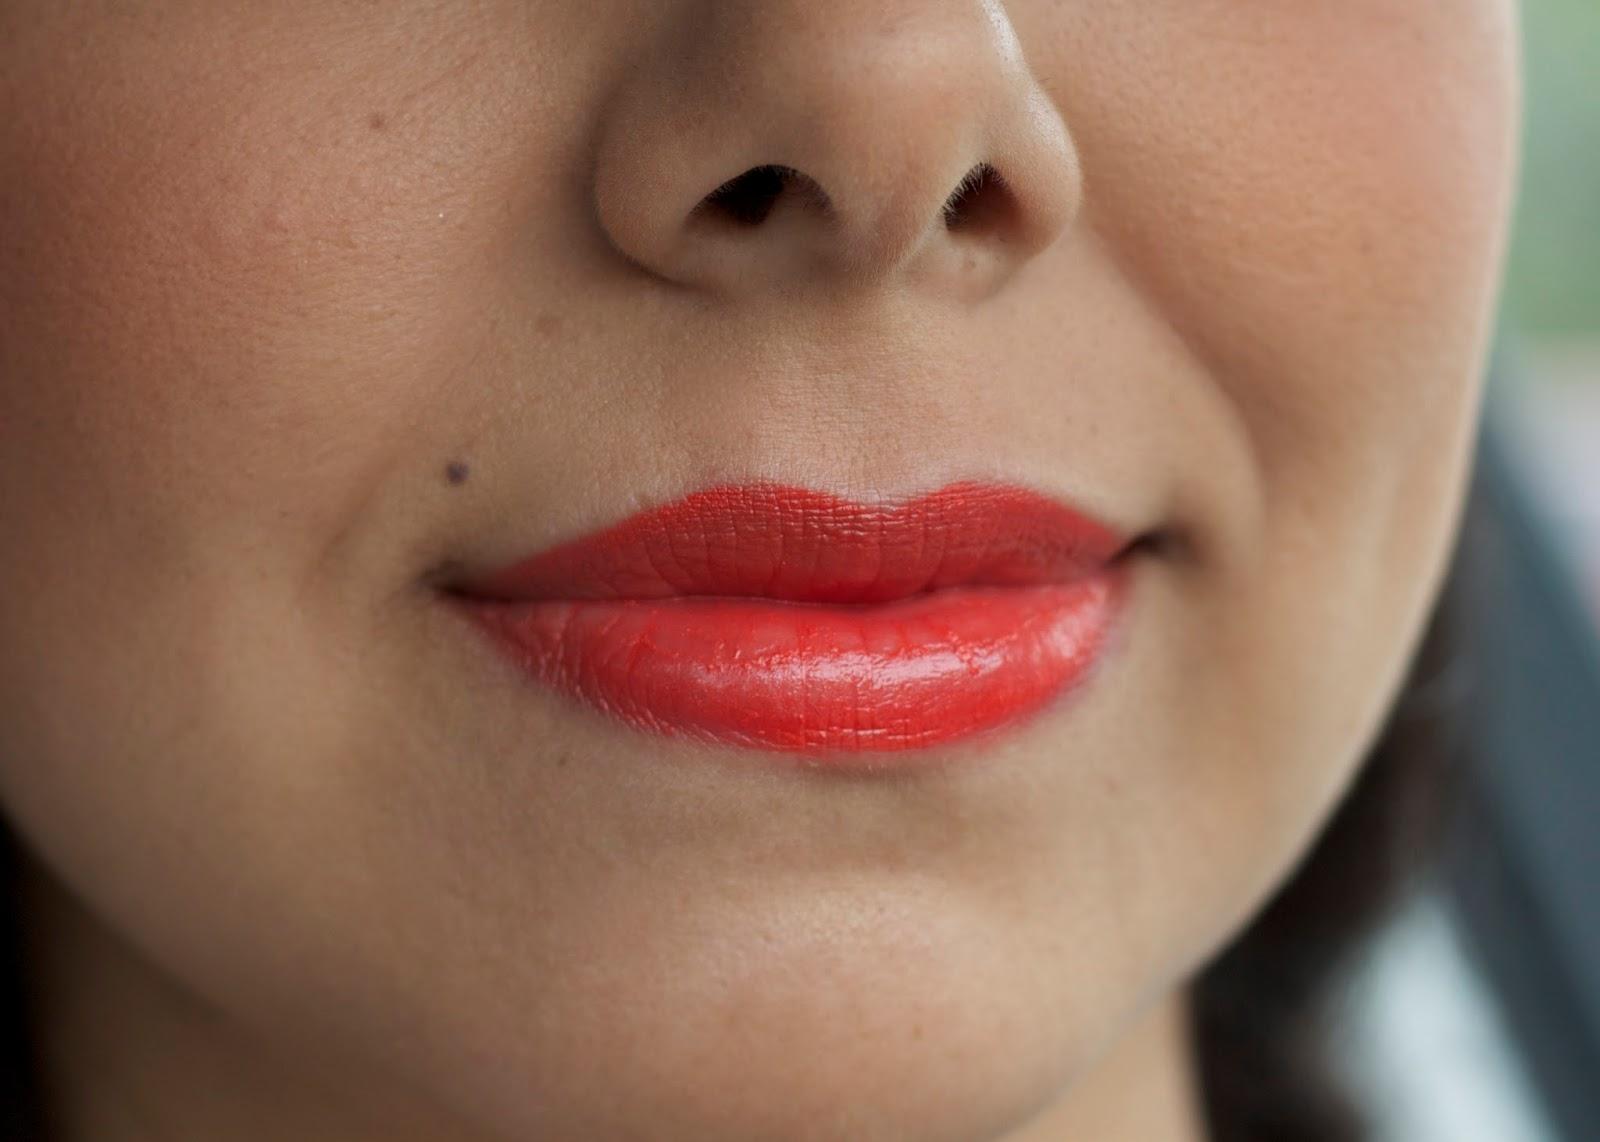 MAC Wash and Dry Collection Morange lipstick, morange lips, perfect summer lipstick